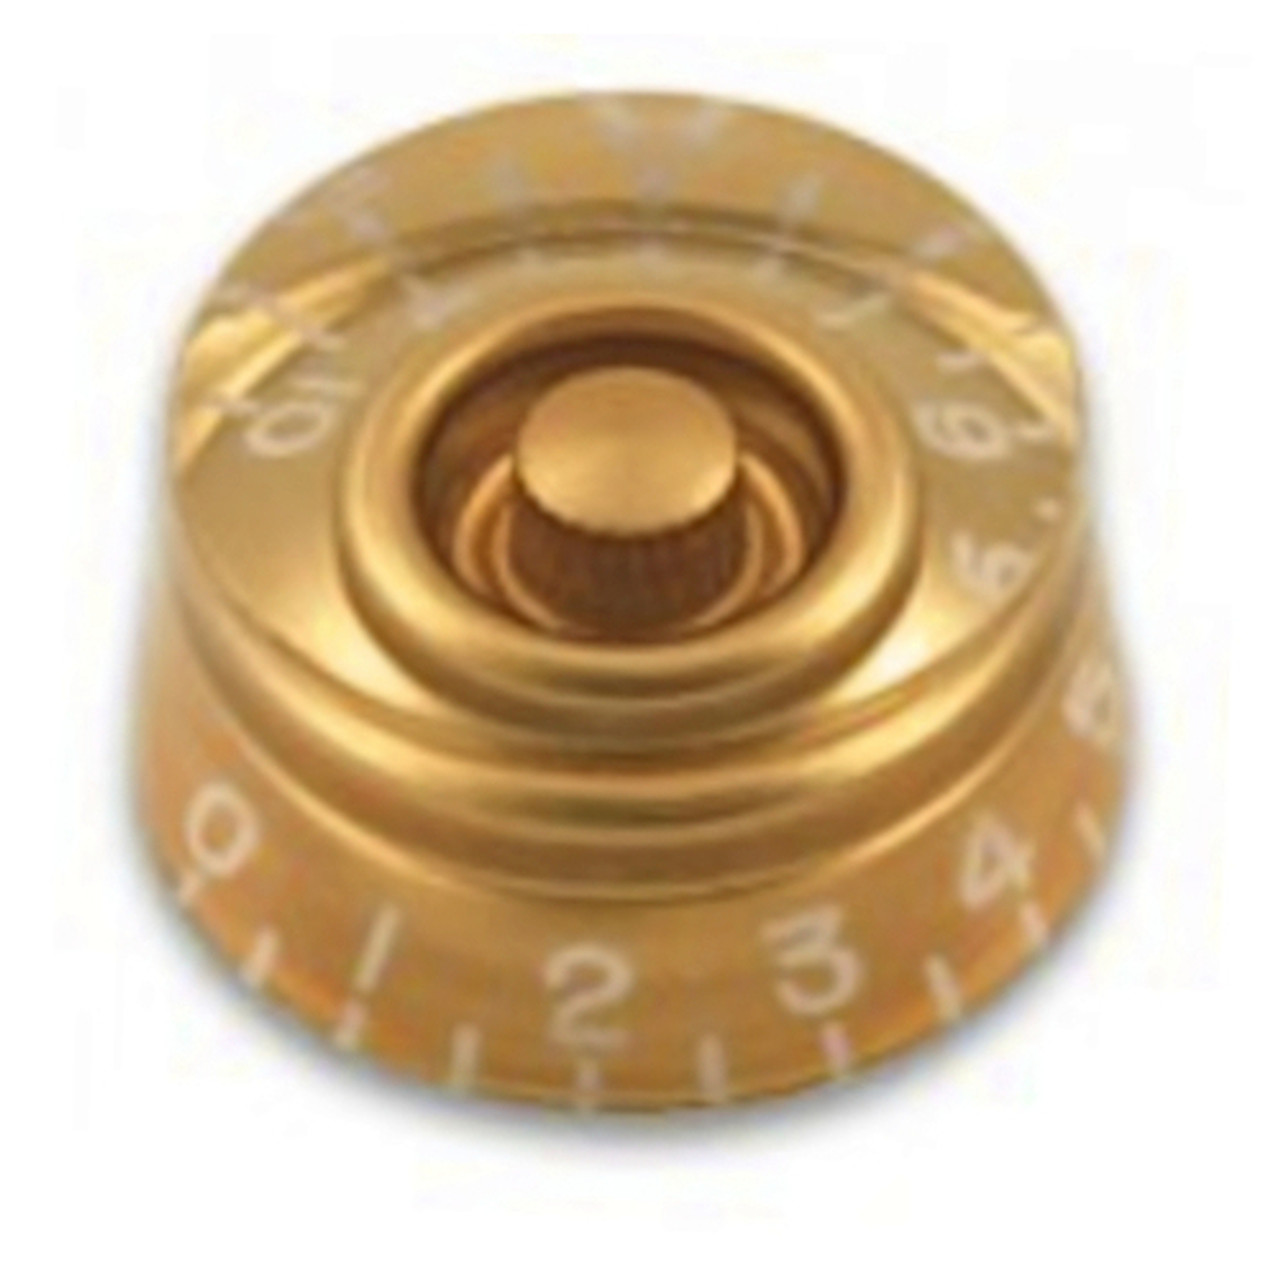 Speed Knob with Coarse Splines-Gold